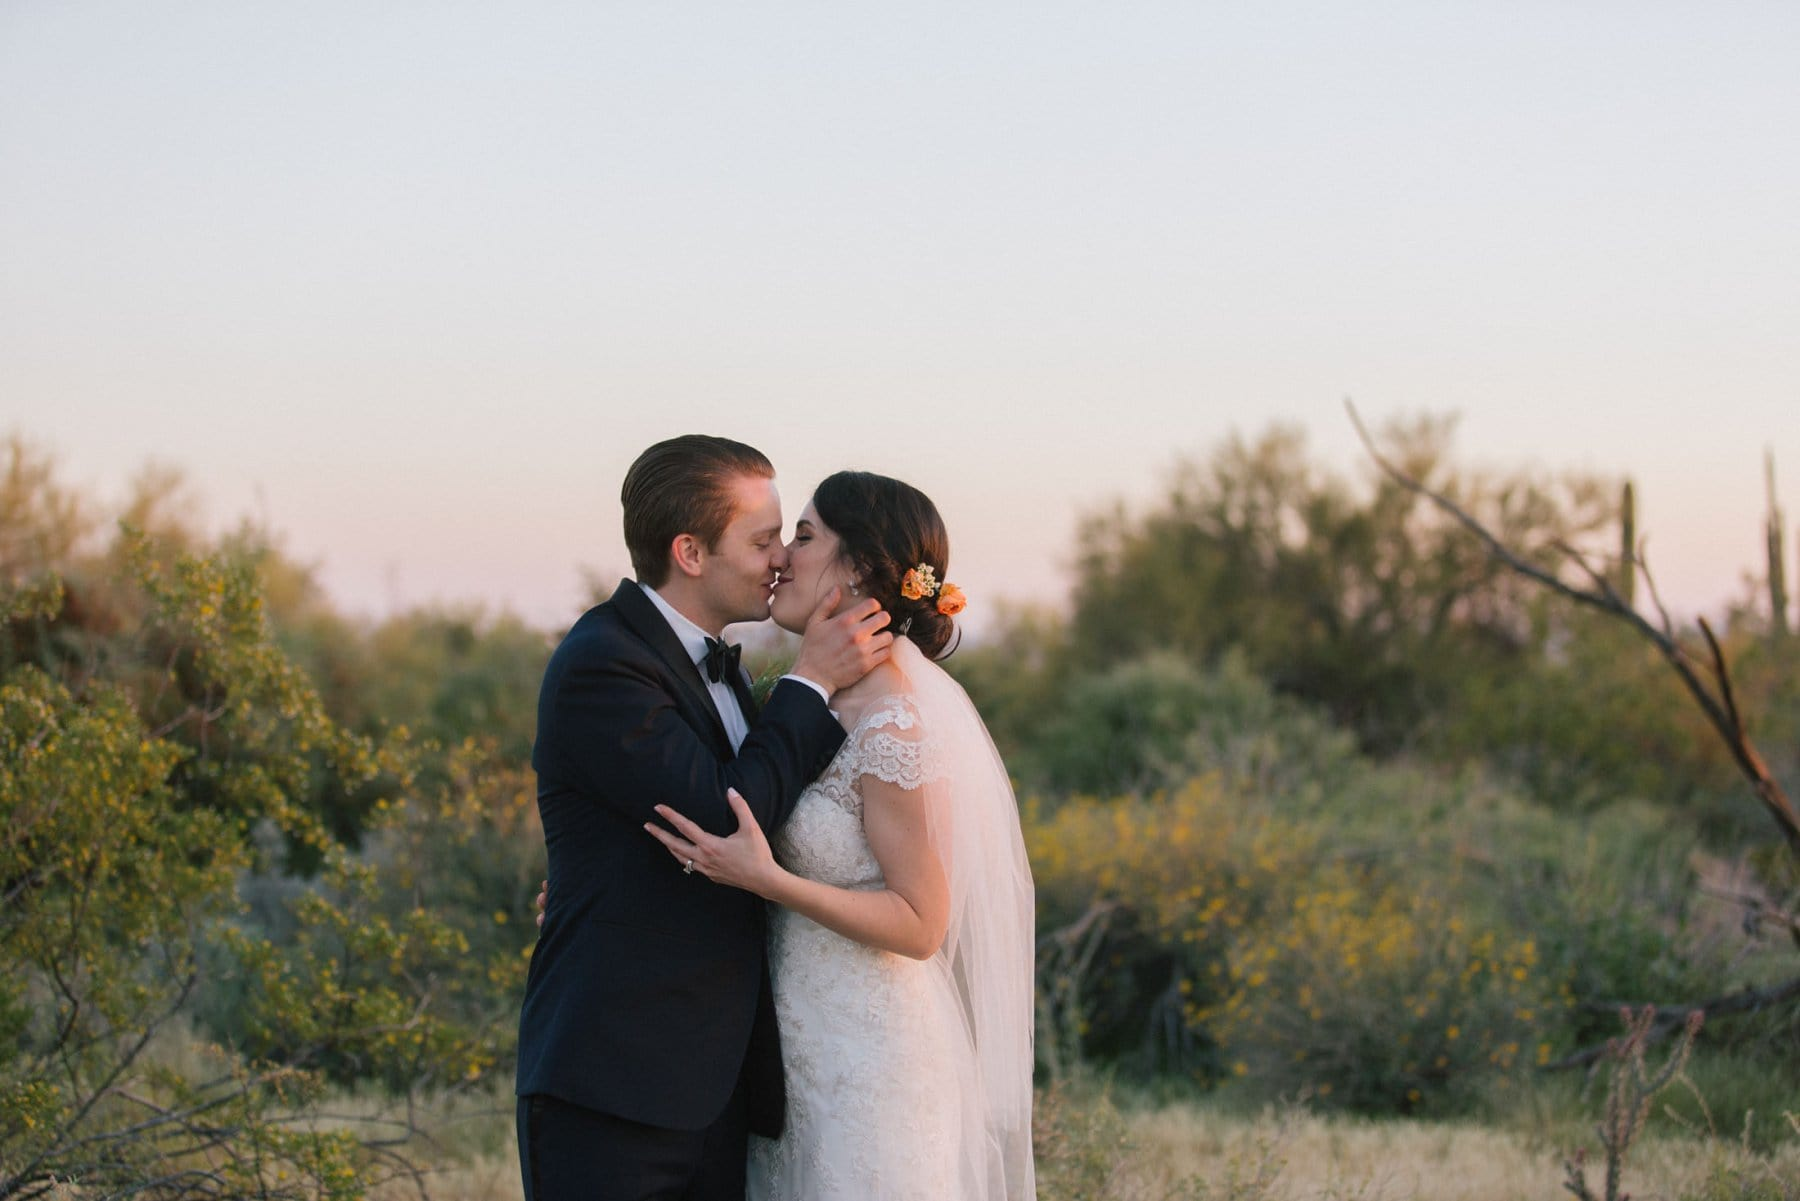 Arizona desert at sunset bride & groom natural real photos